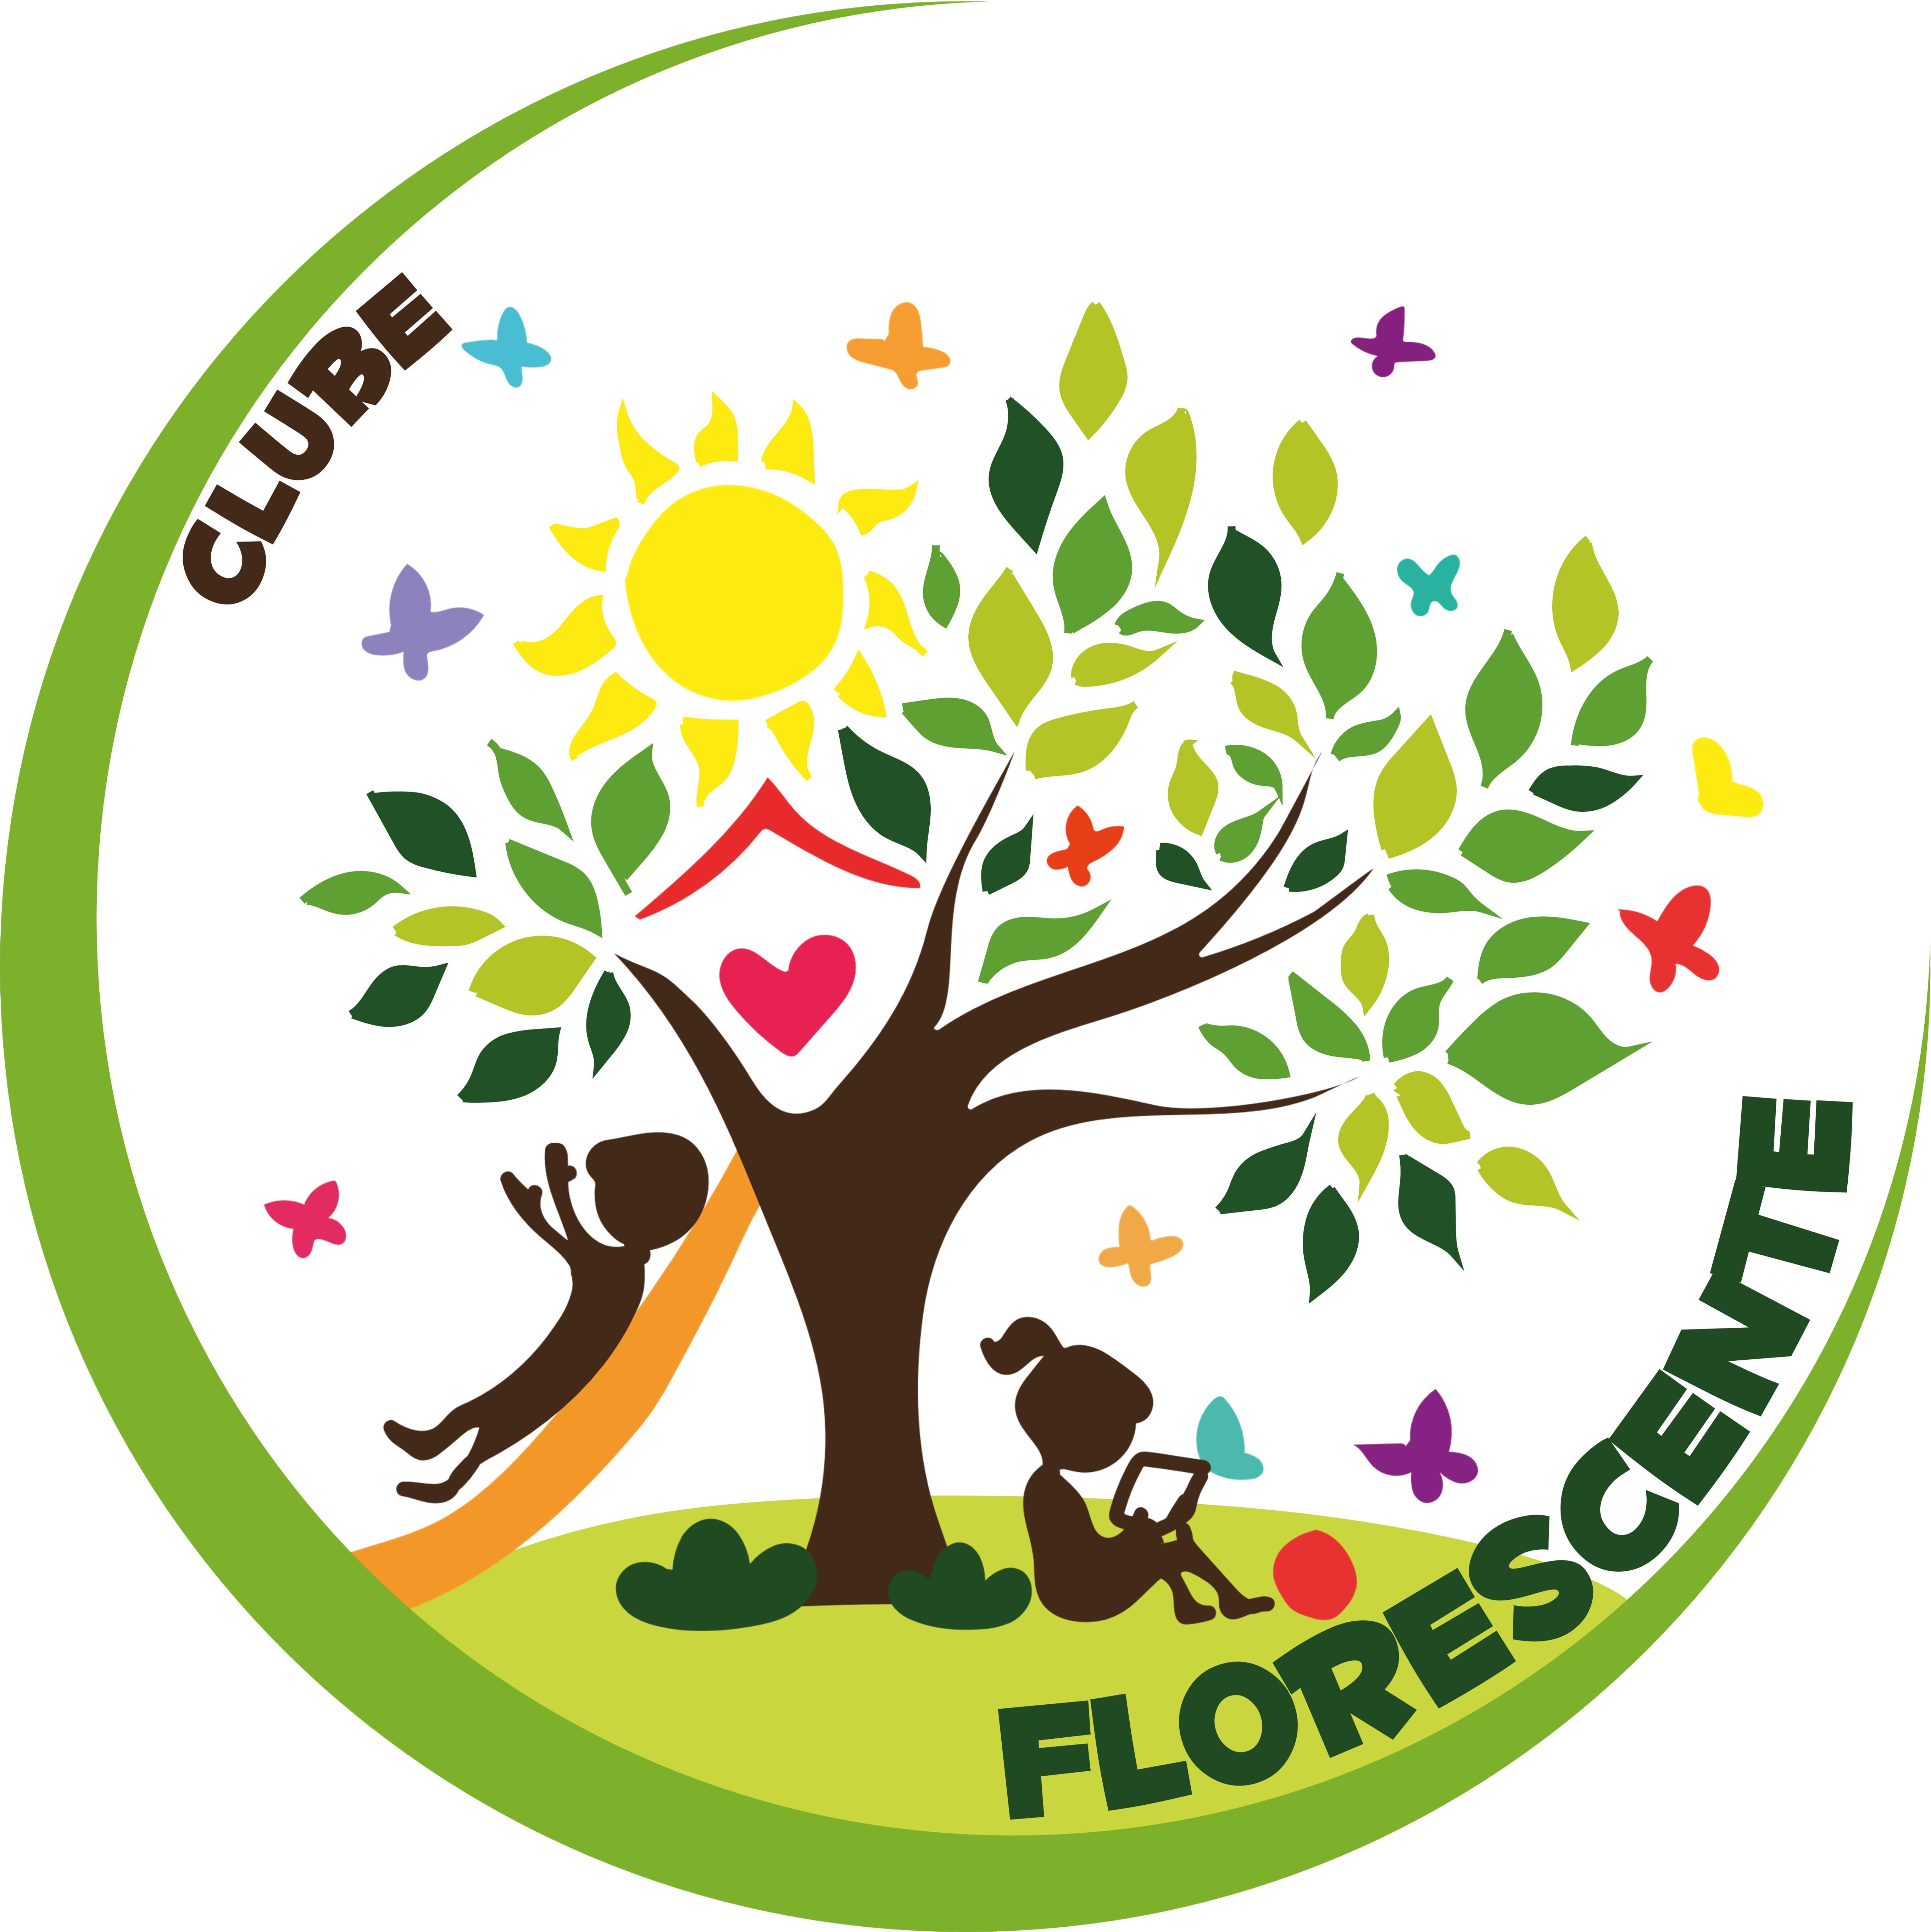 Florescente